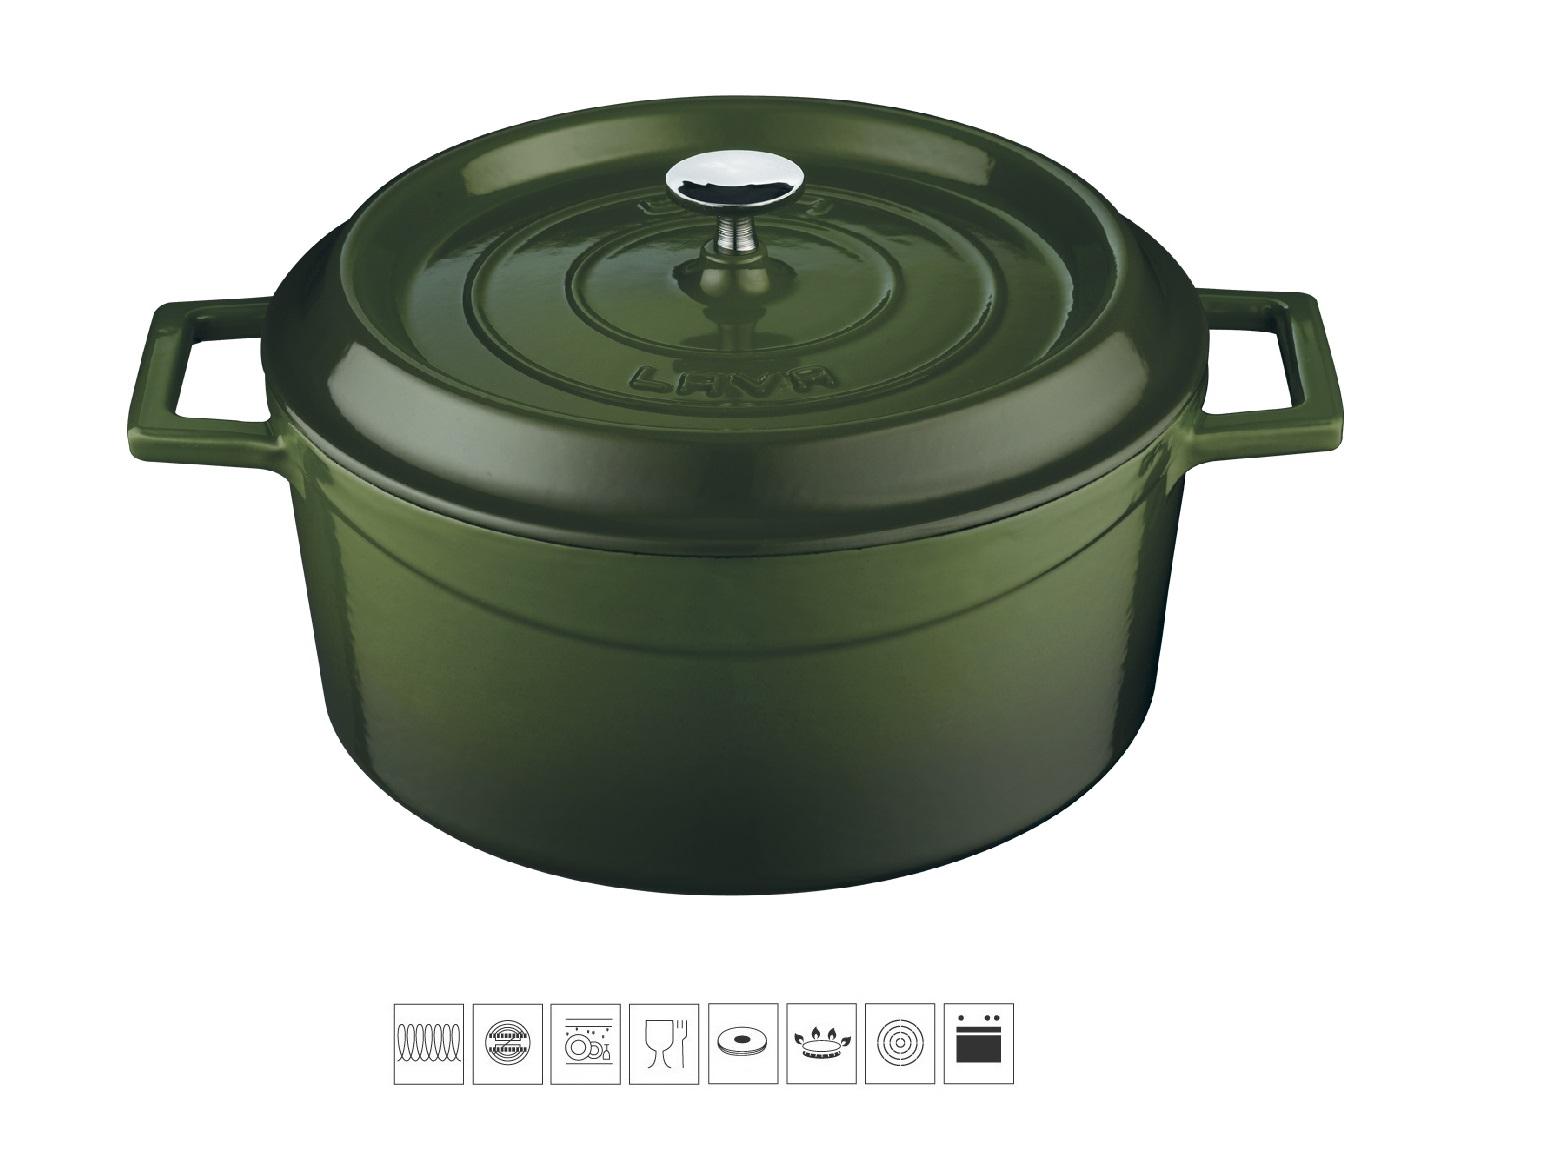 Litinový hrnec kulatý 20 cm - zelený